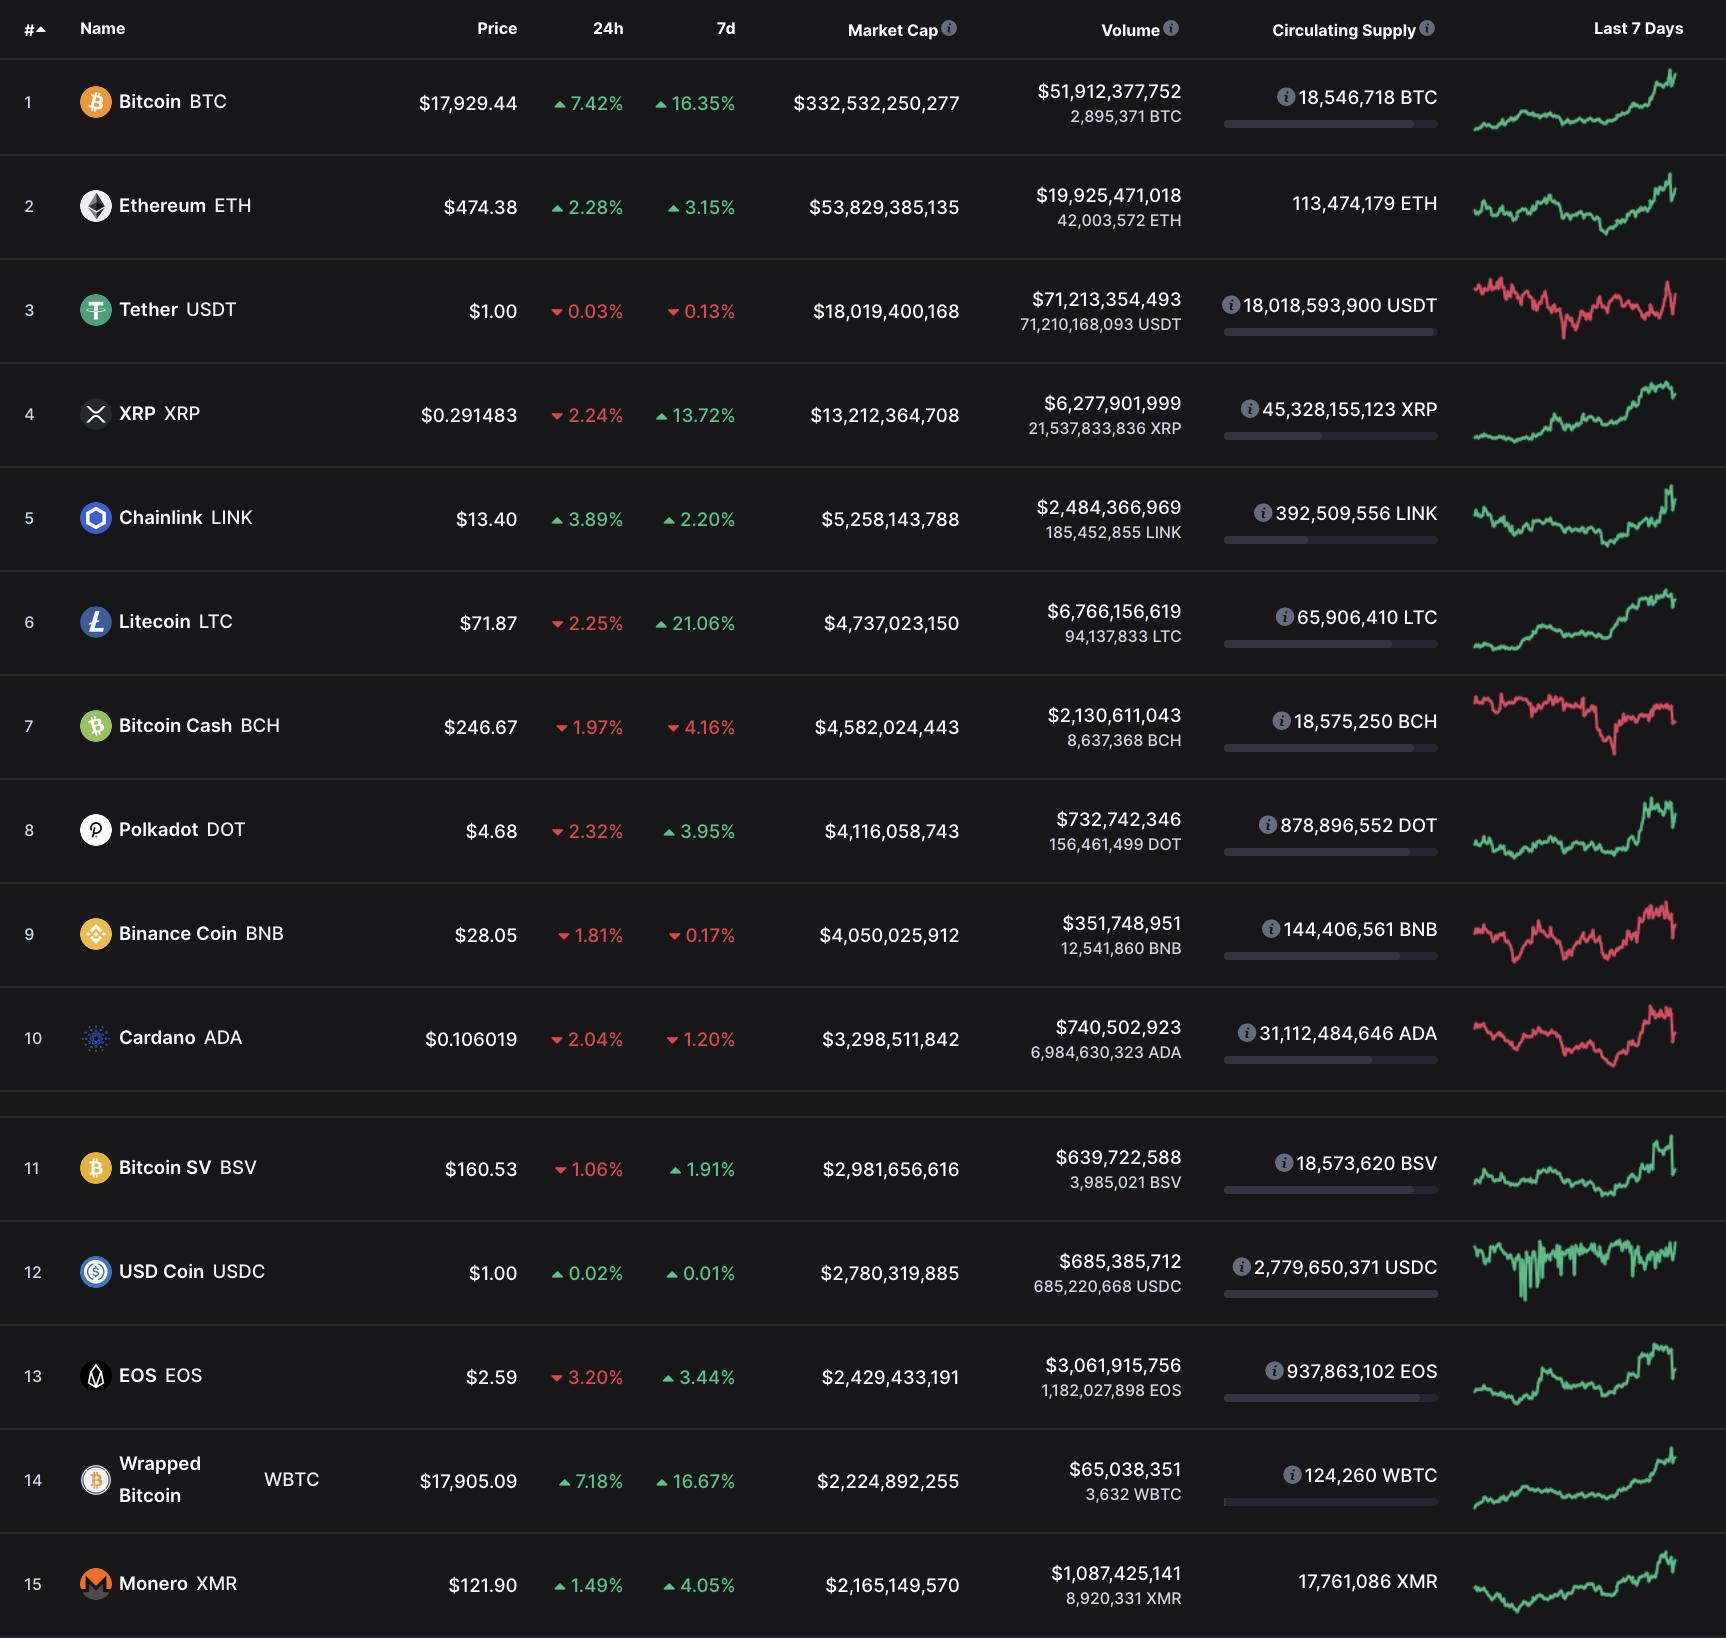 Top cryptos, Nov 2020